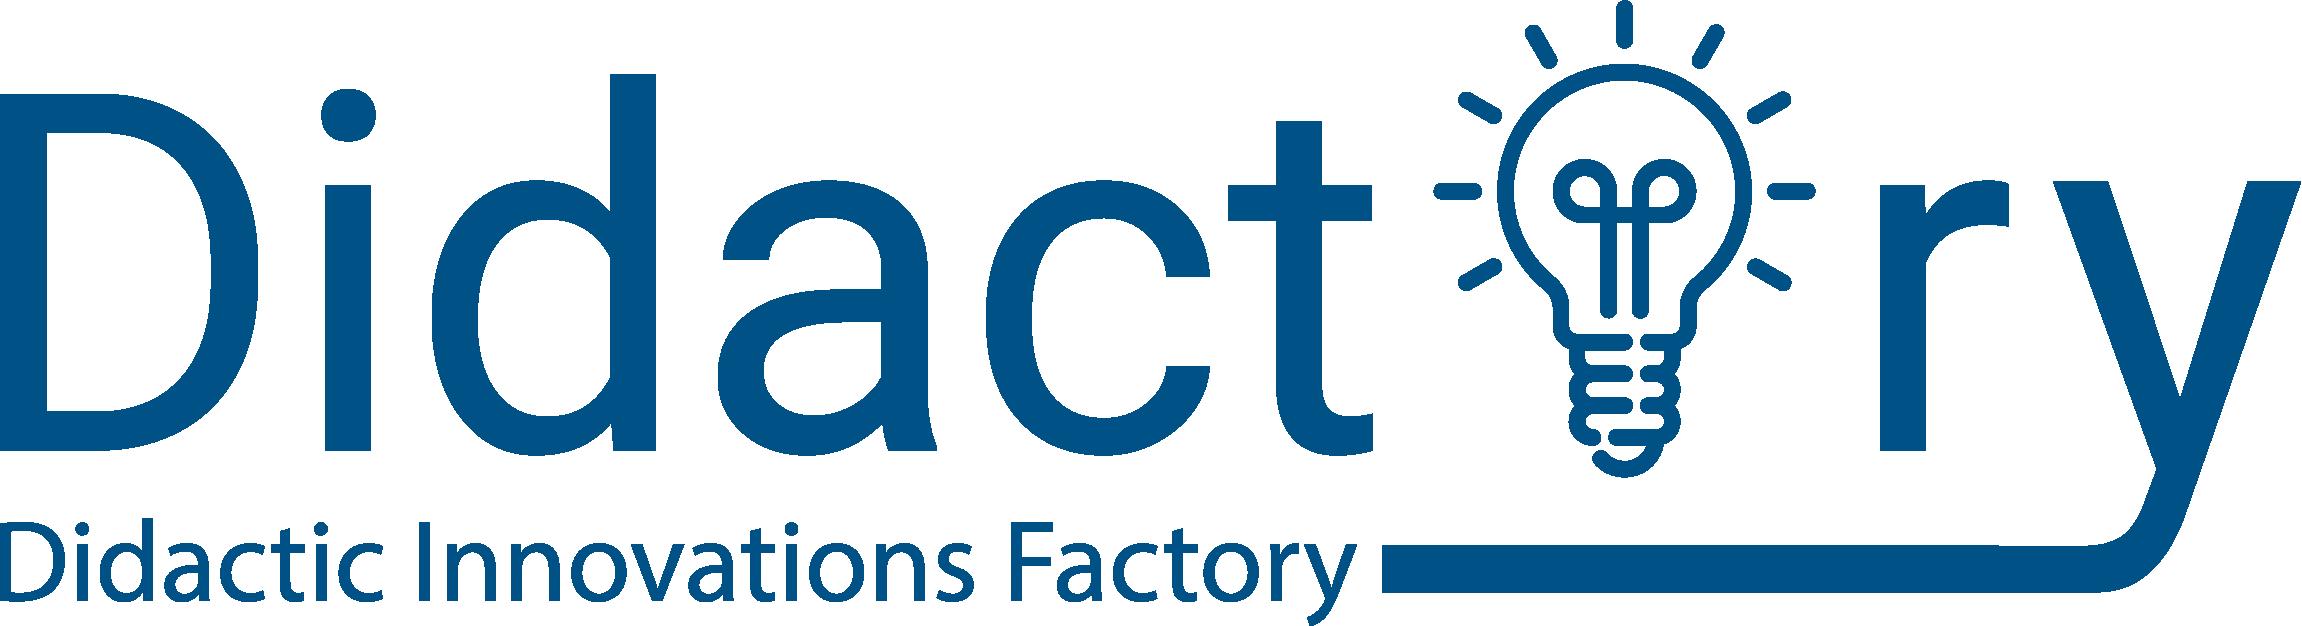 Didactory Logo